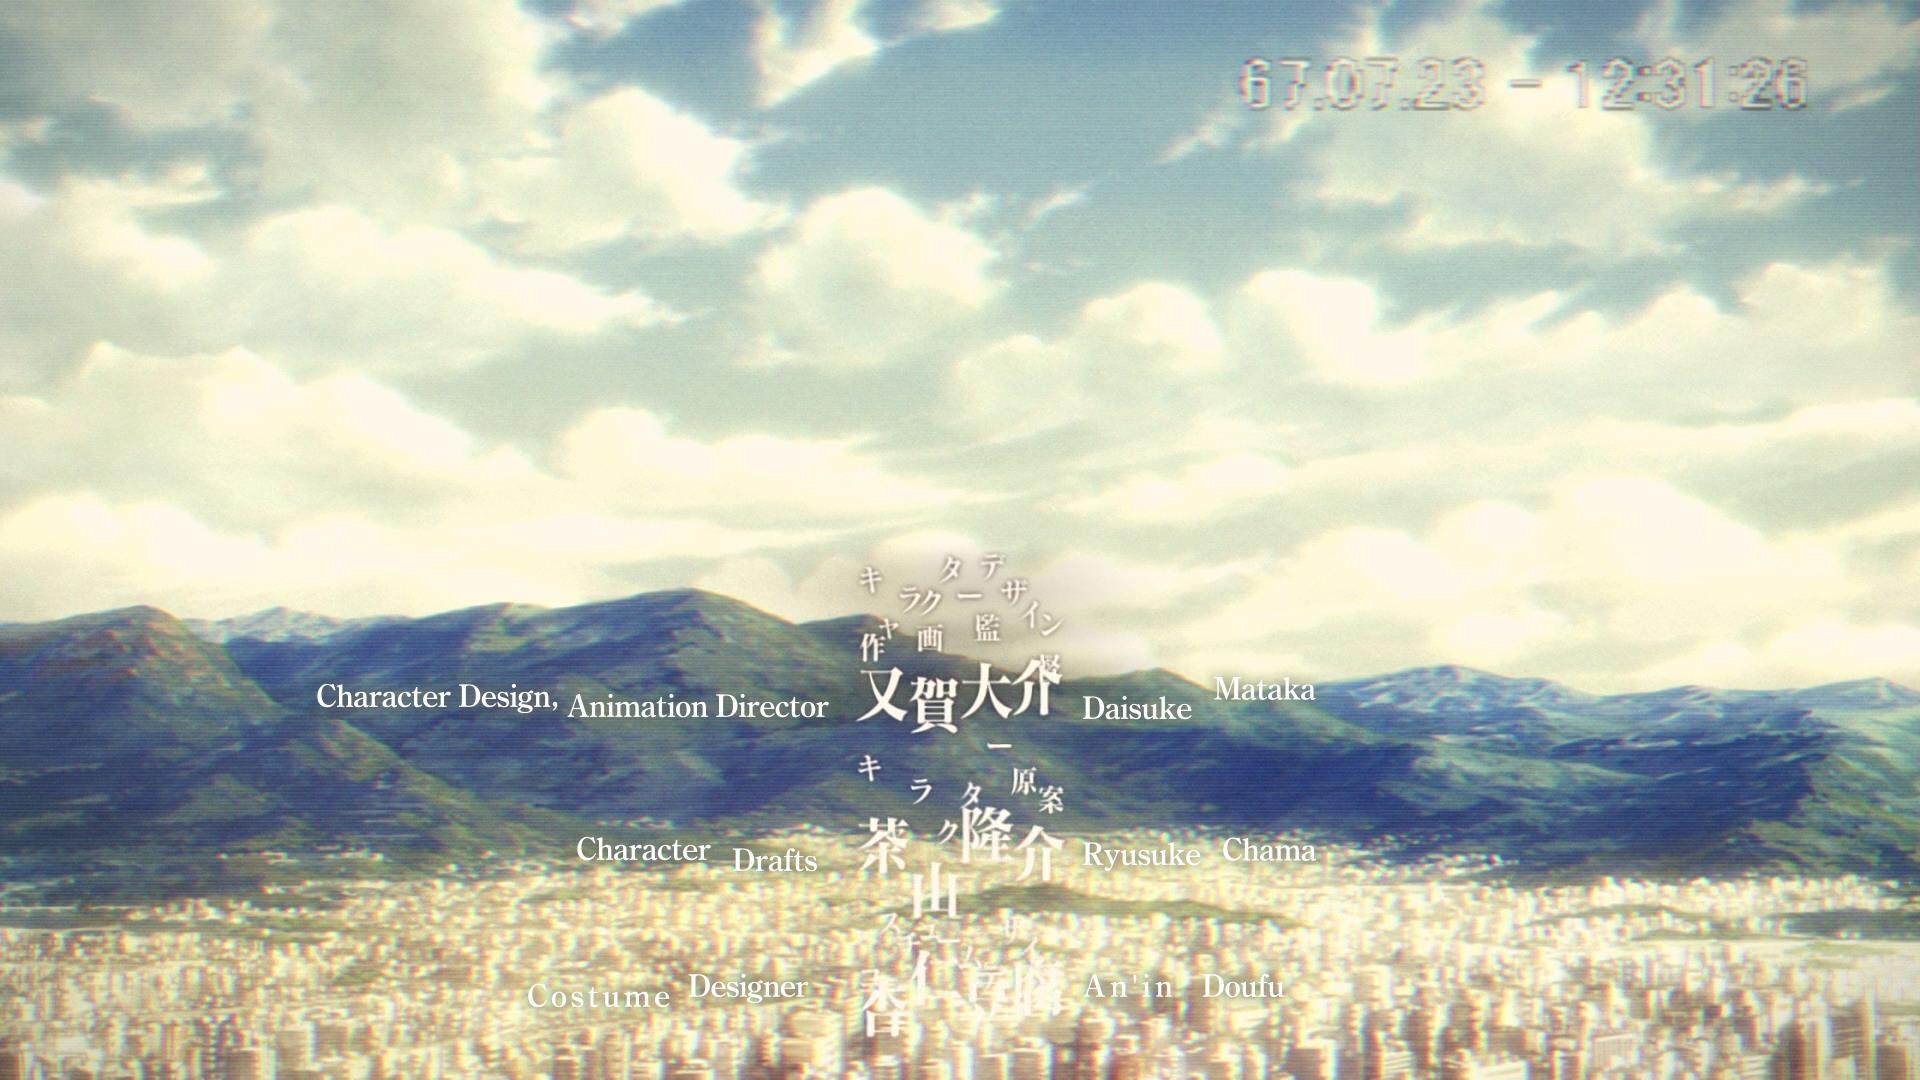 patema inverted english dub full movie download